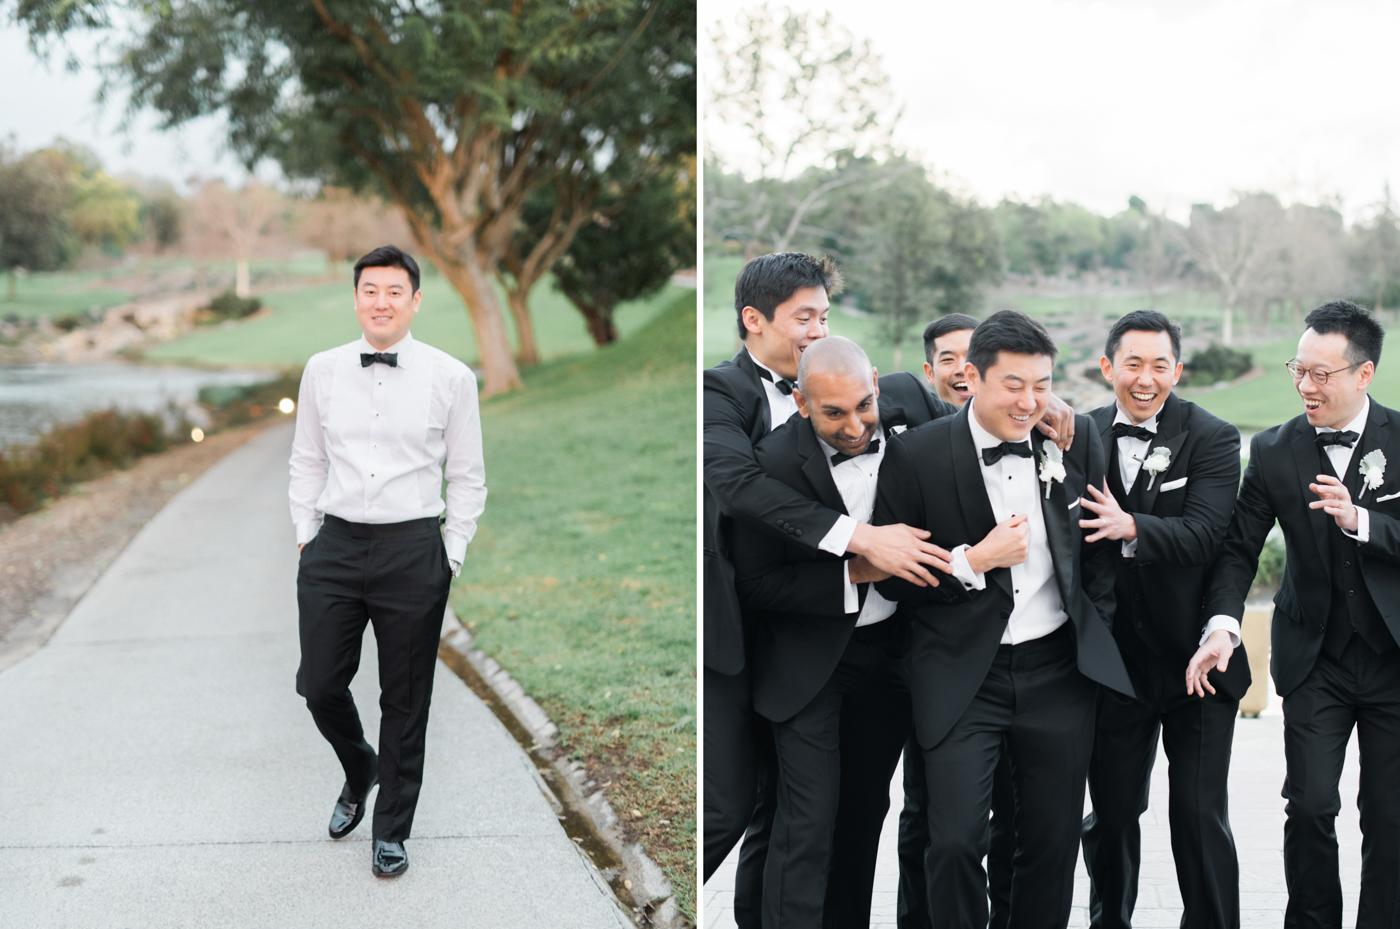 Friendly_Hills_Country_Club_fine_art_wedding_photographer_los_angeles_paris-21.jpg